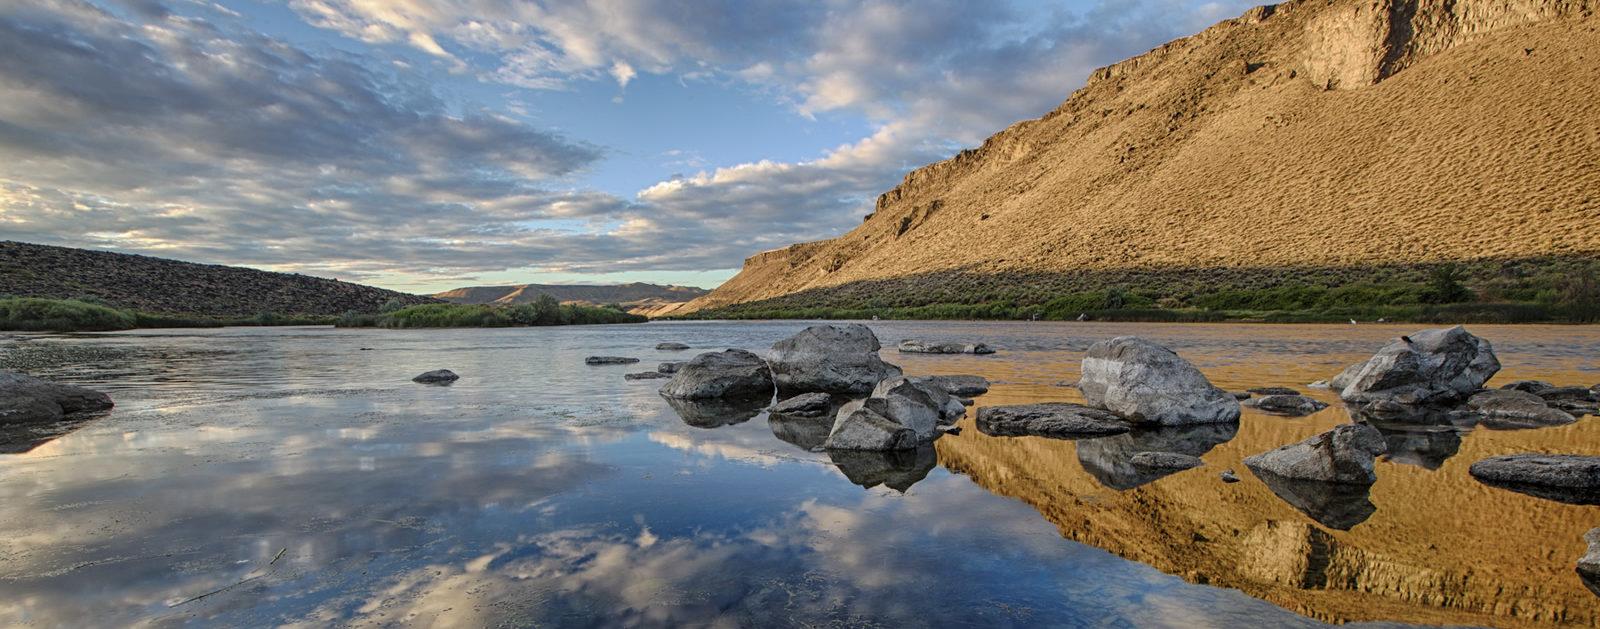 Southern Idaho's Snake River | Bob Wick, BLM